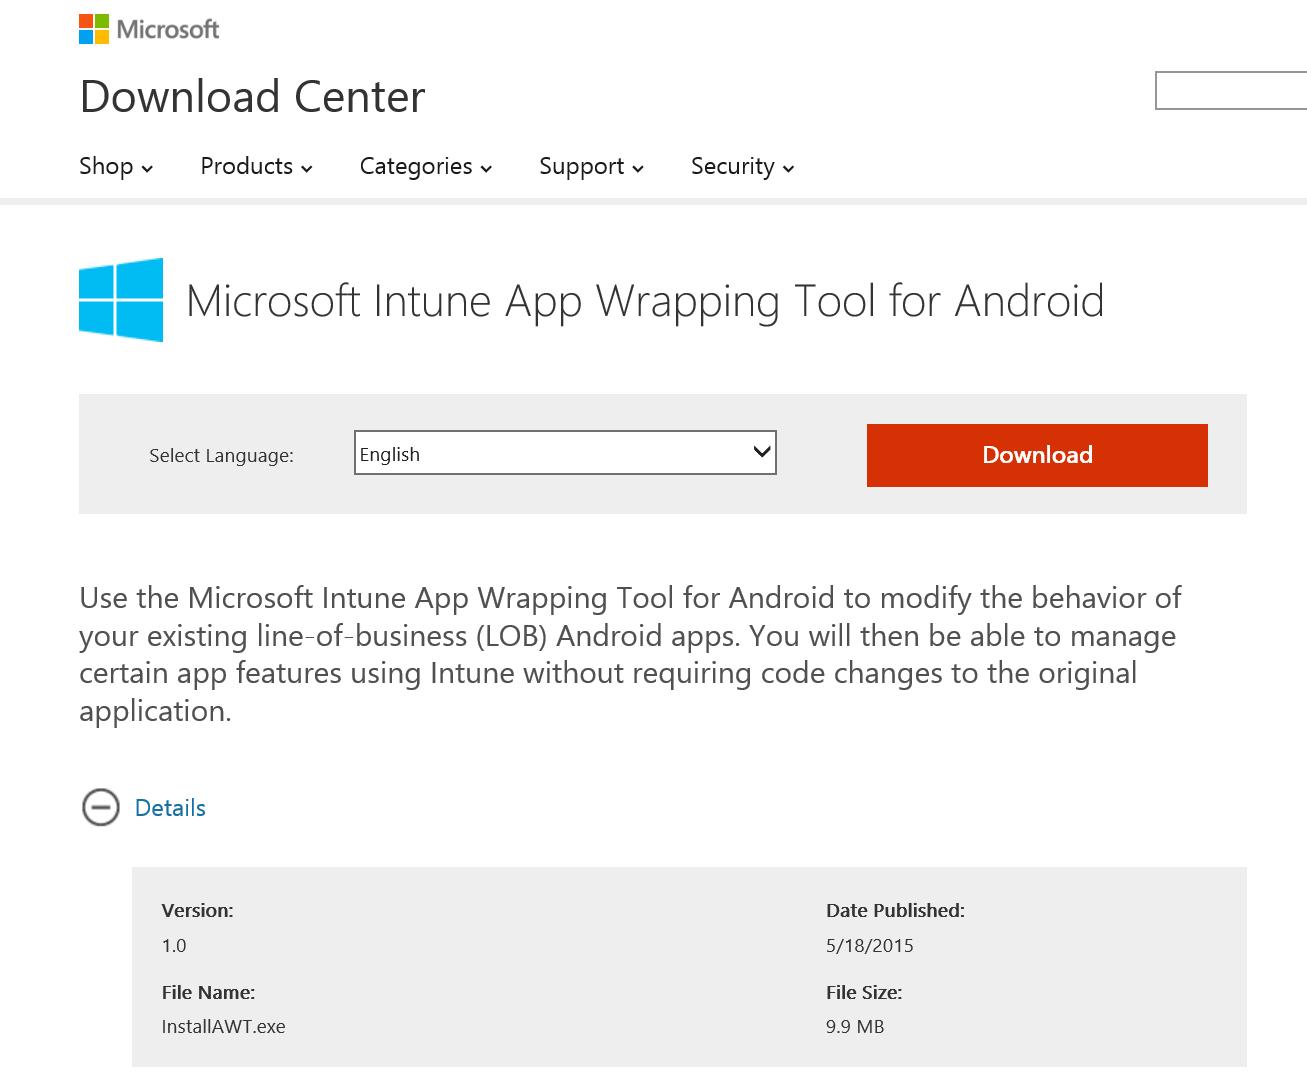 Gerry Hampson Device Management: Microsoft Intune App